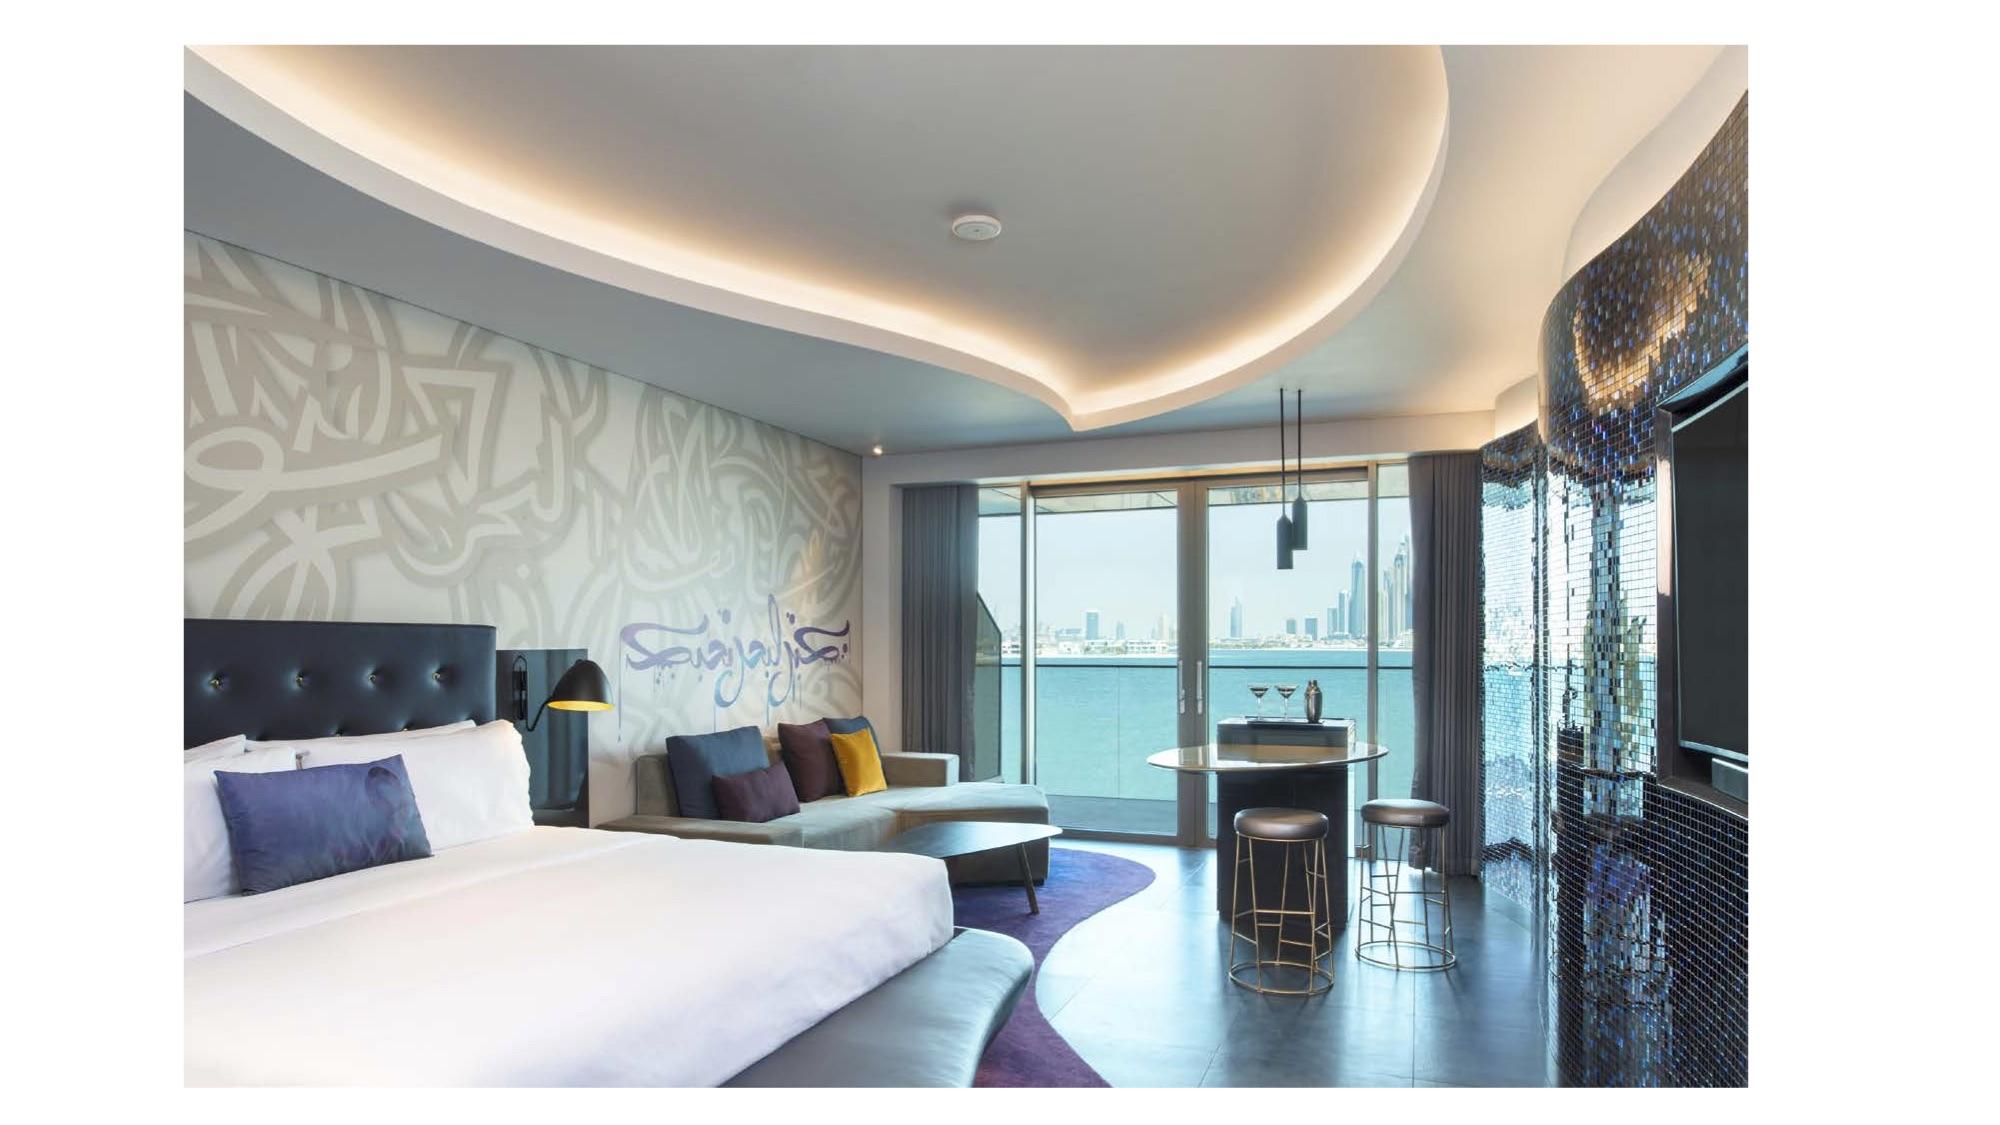 Mock Up Rooms W Hotel.jpg